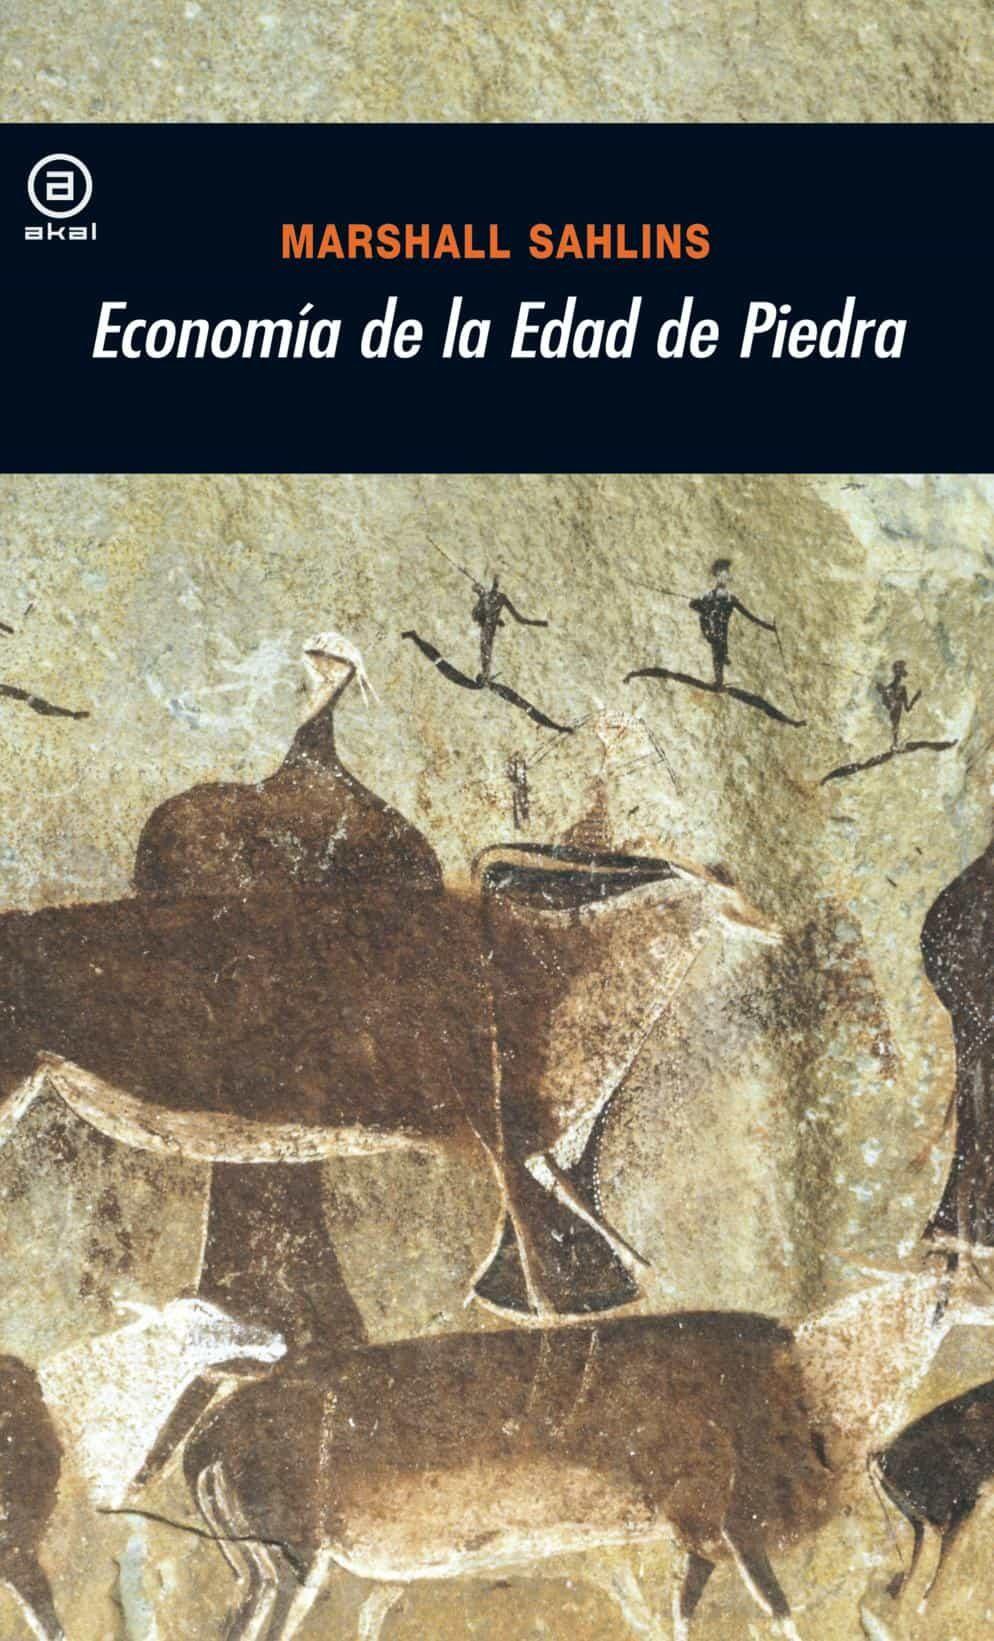 economia de la edad de piedra edmarshall d sahlins